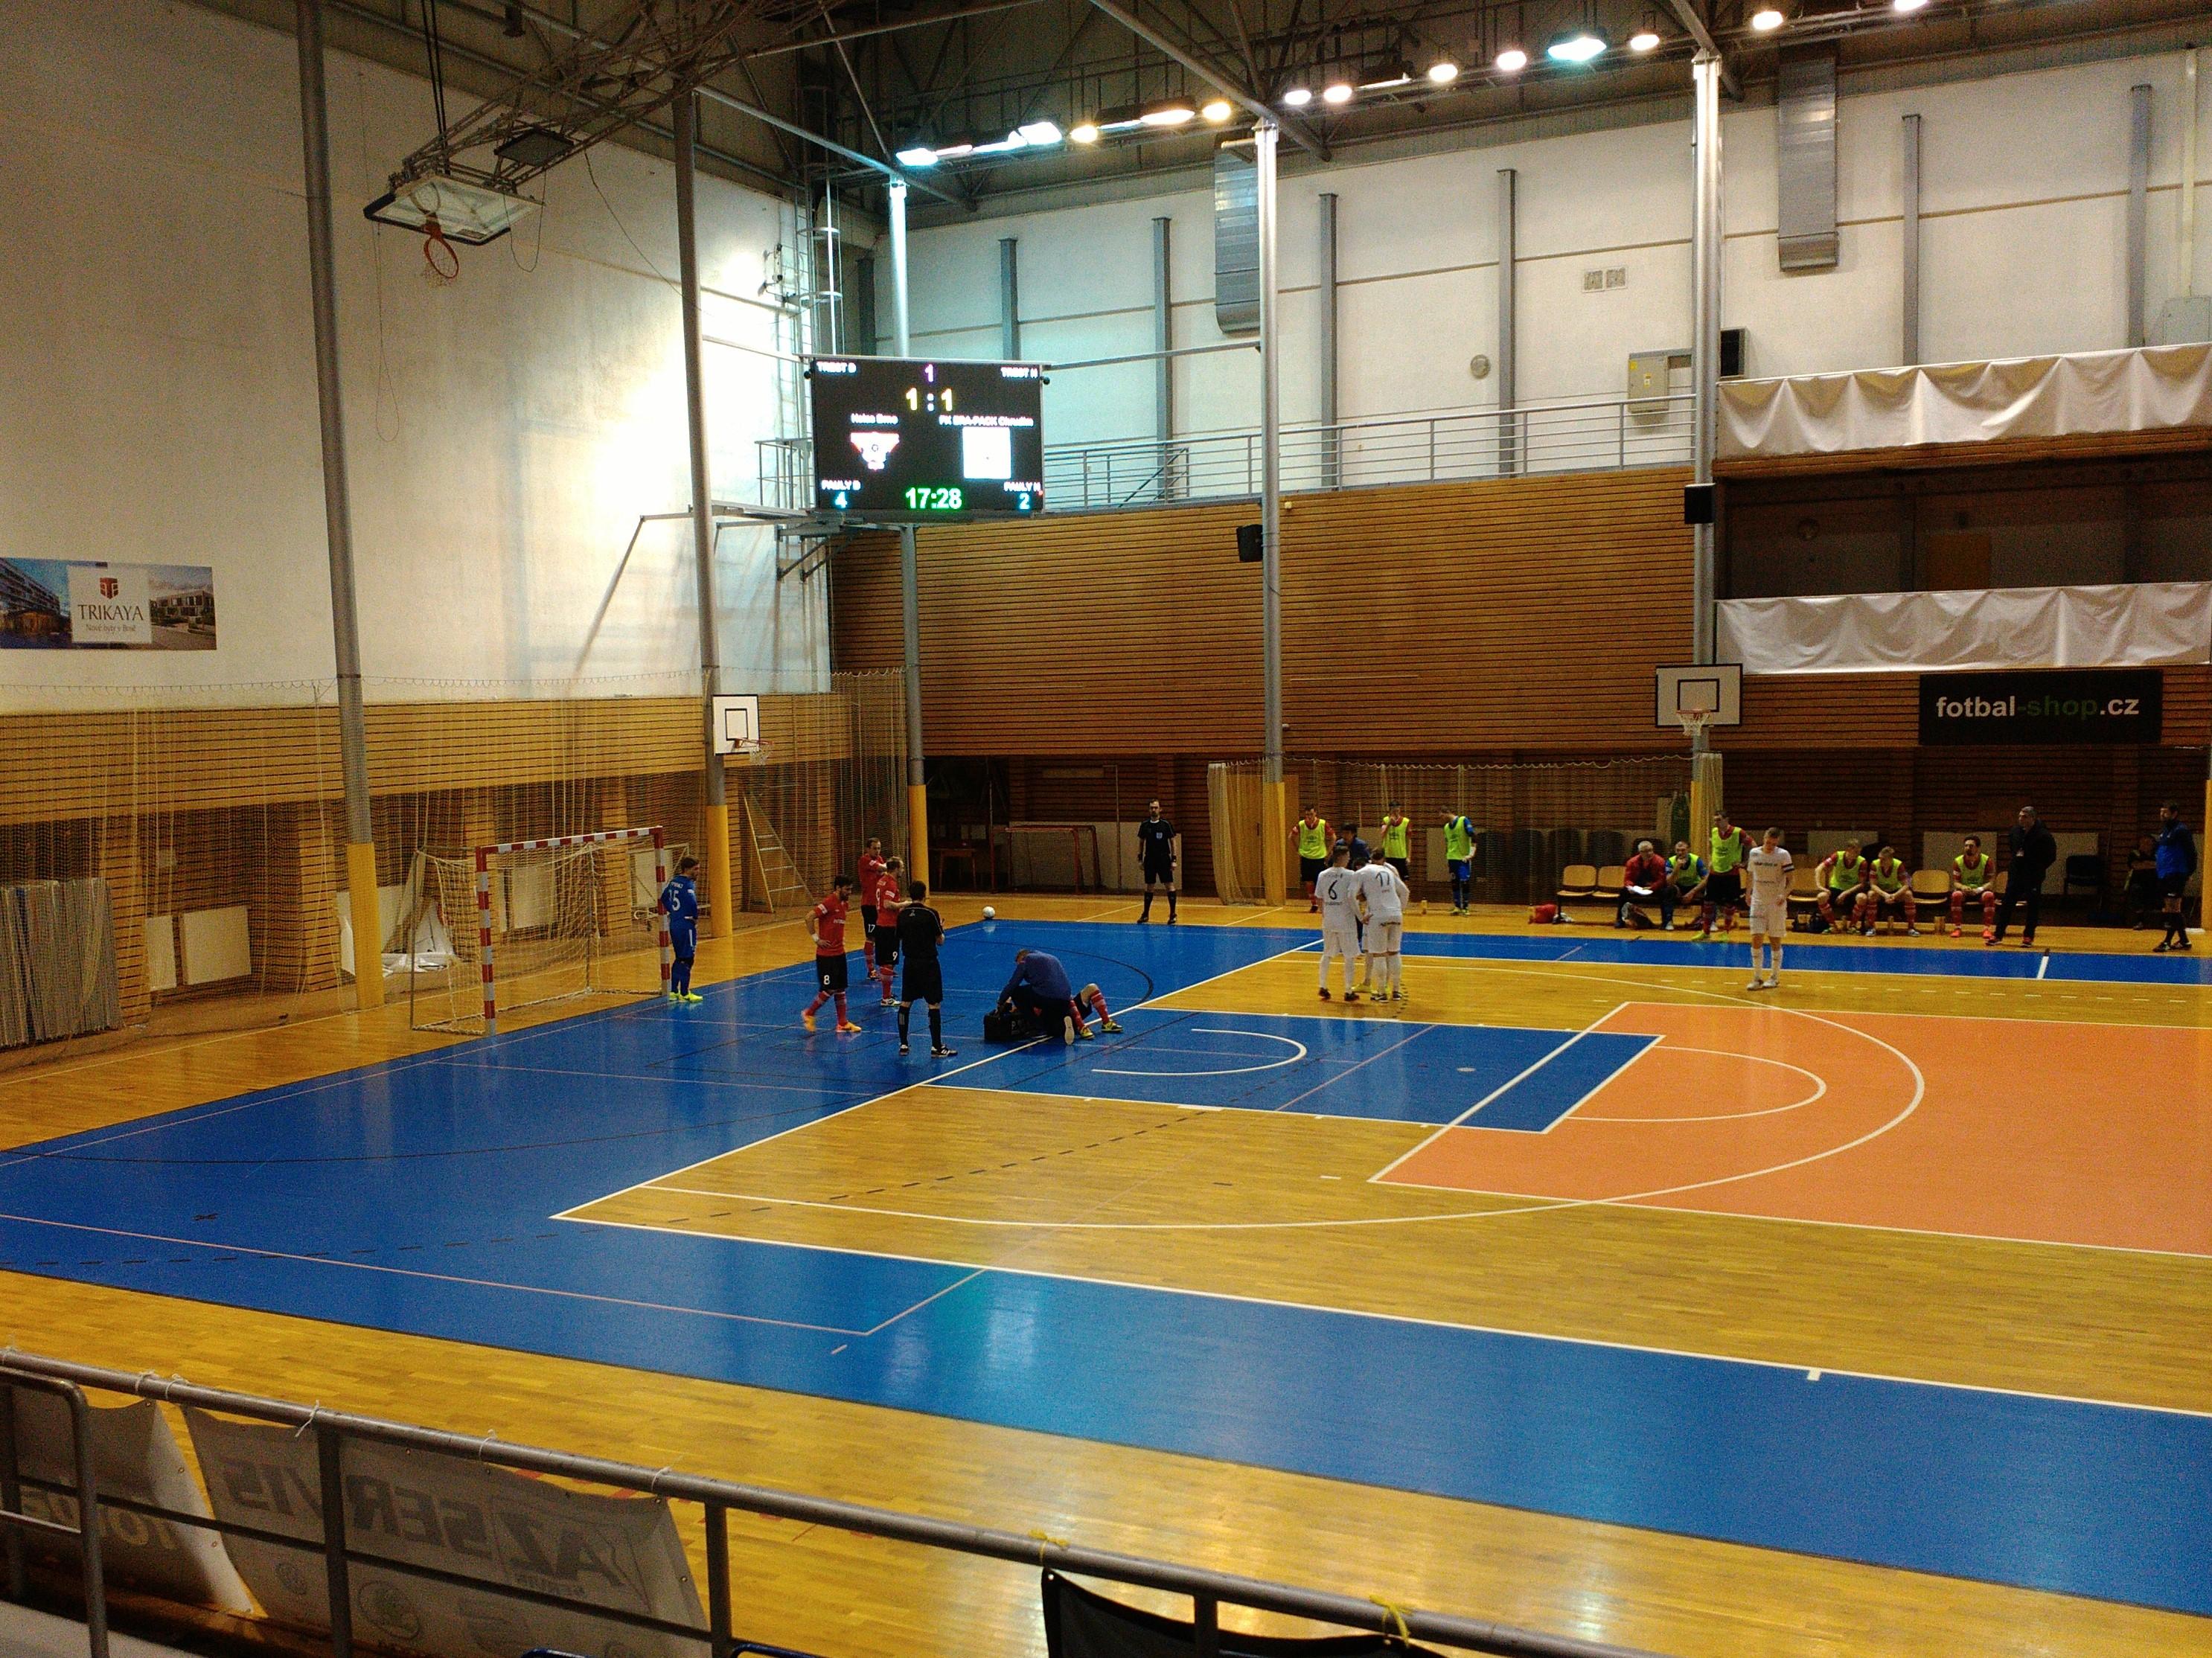 Futsalisté Helasu Brno doma podlehli Chrudimi 1:5.